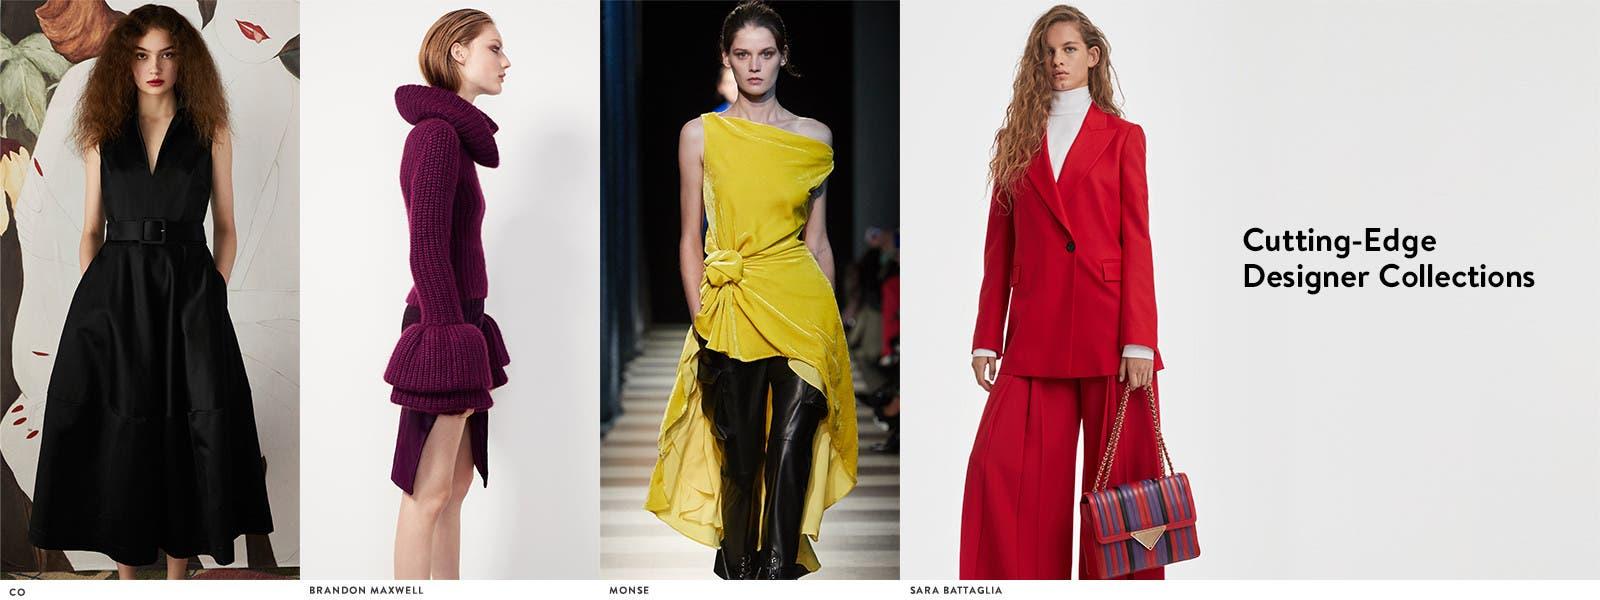 Cutting-edge designer collections: Co, Brandon Maxwell, Monse, Sara Battaglia.